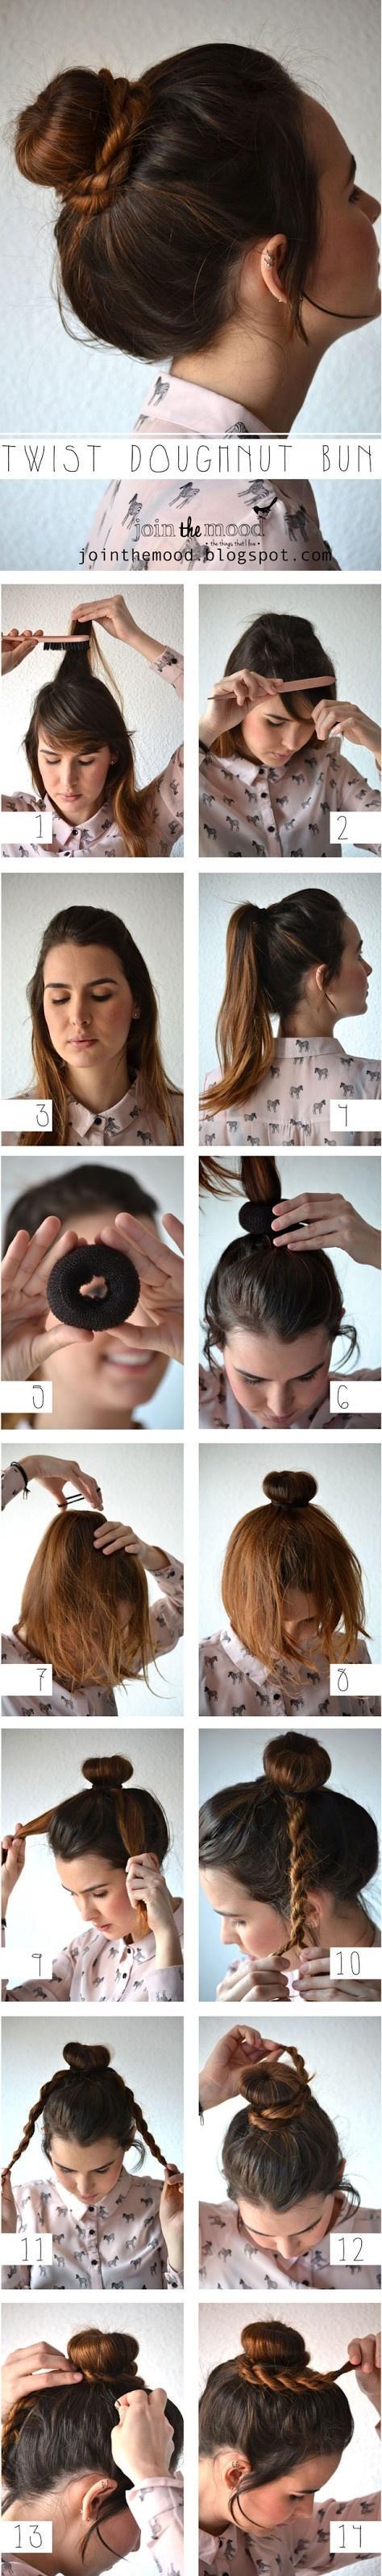 DIY Twist Doughnut Bun Hairstyle via